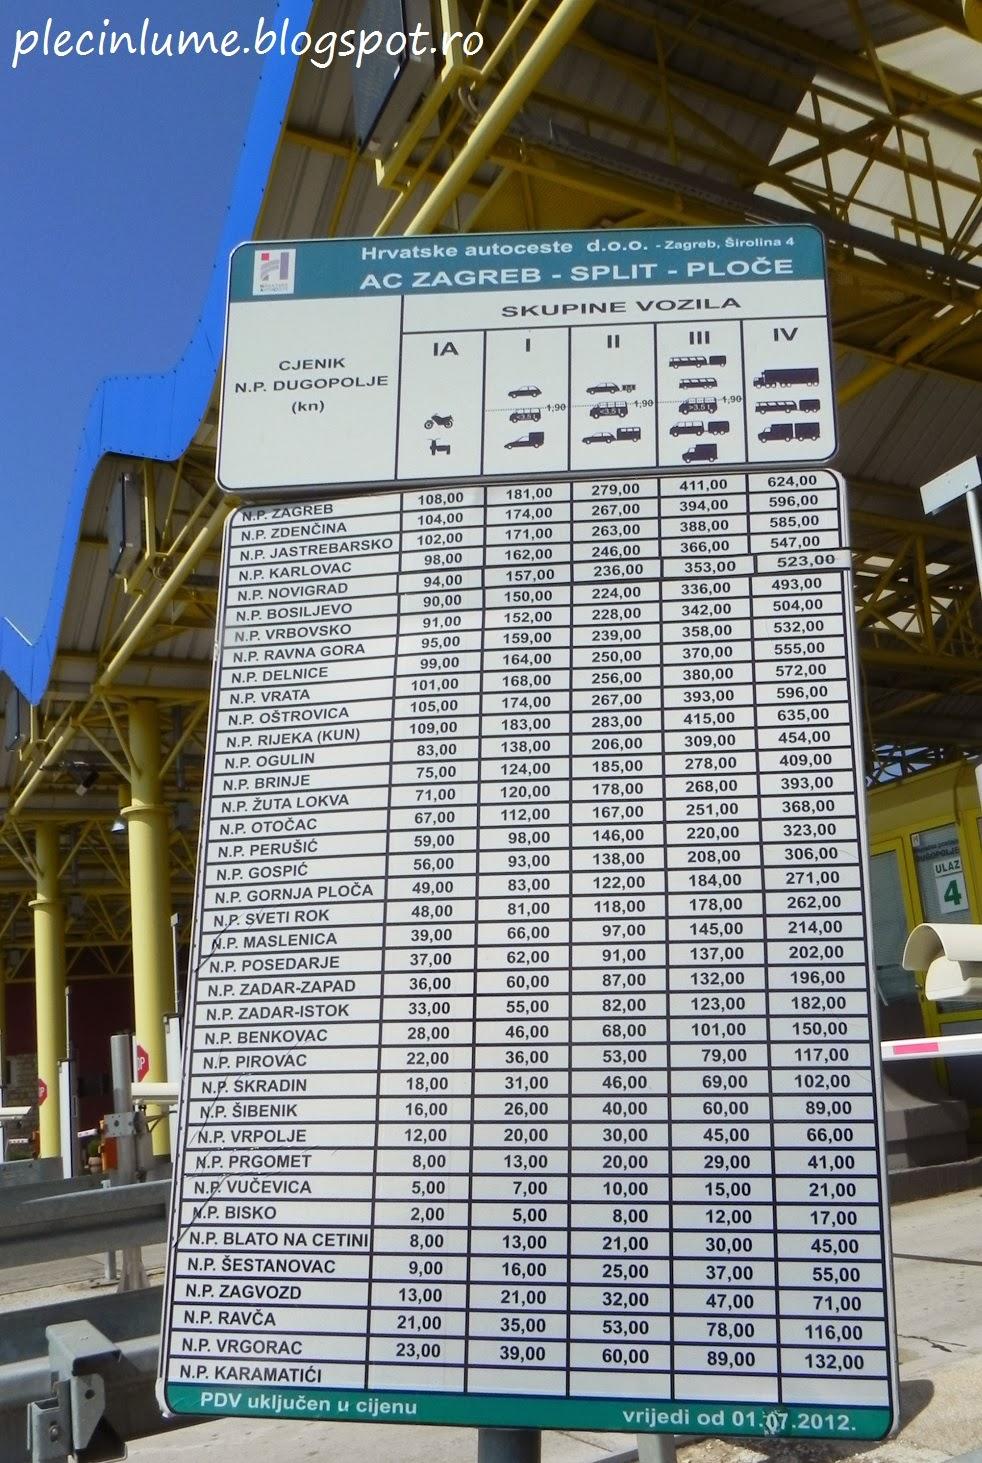 Taxe de autostrada 2013 in Crostia